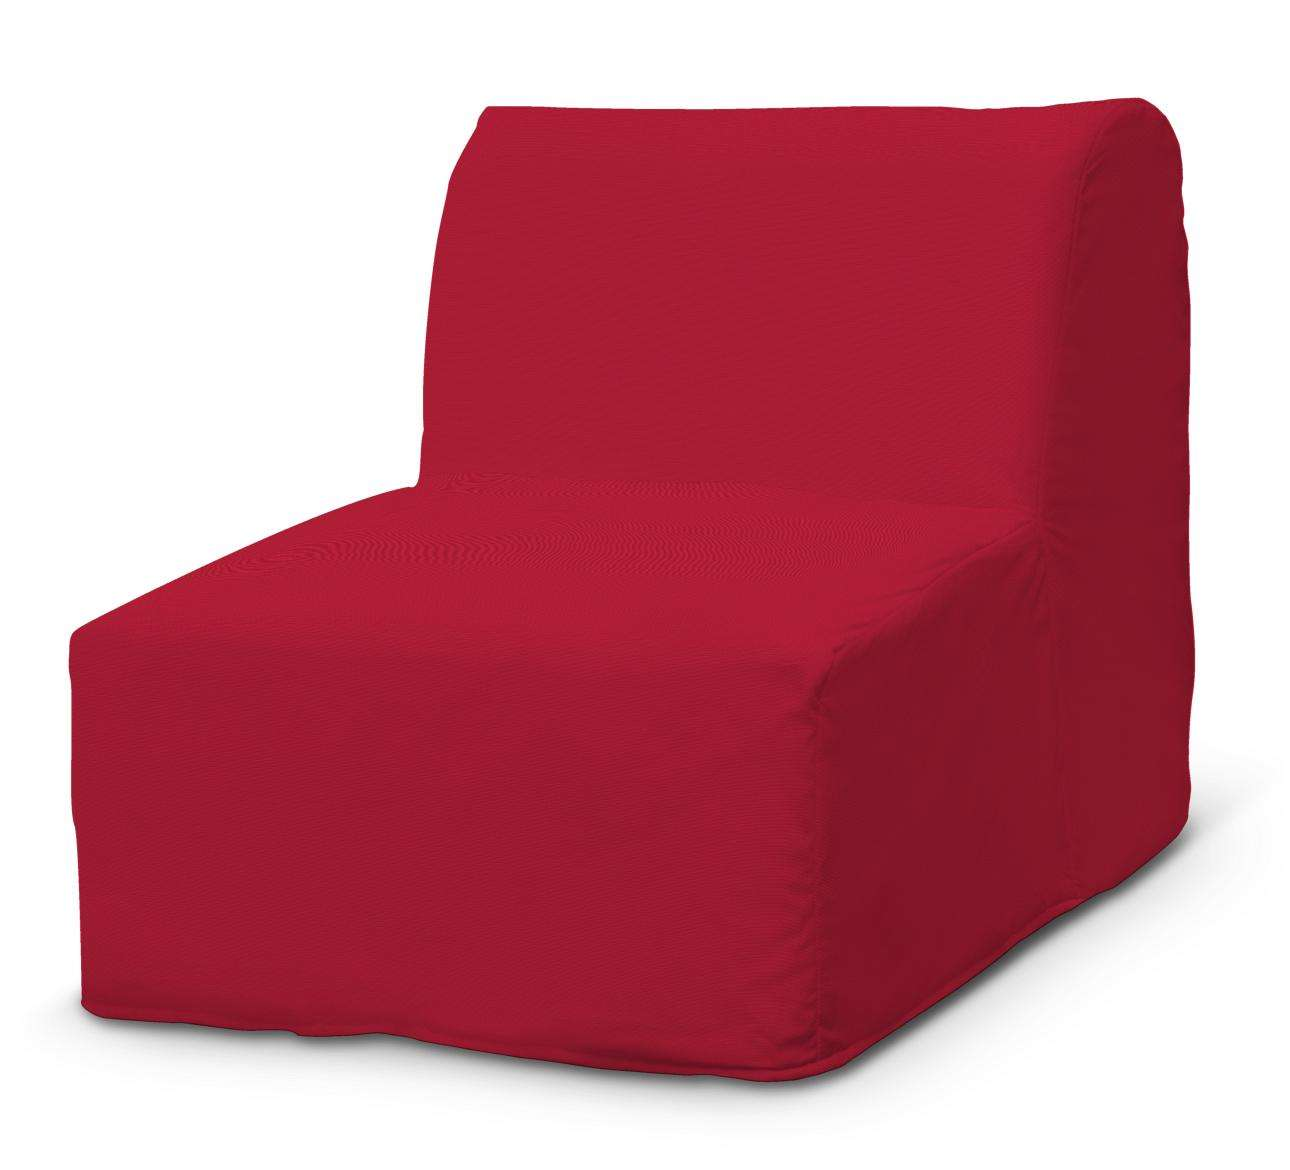 Lycksele Sesselbezug fotel Lycksele von der Kollektion Cotton Panama, Stoff: 702-04